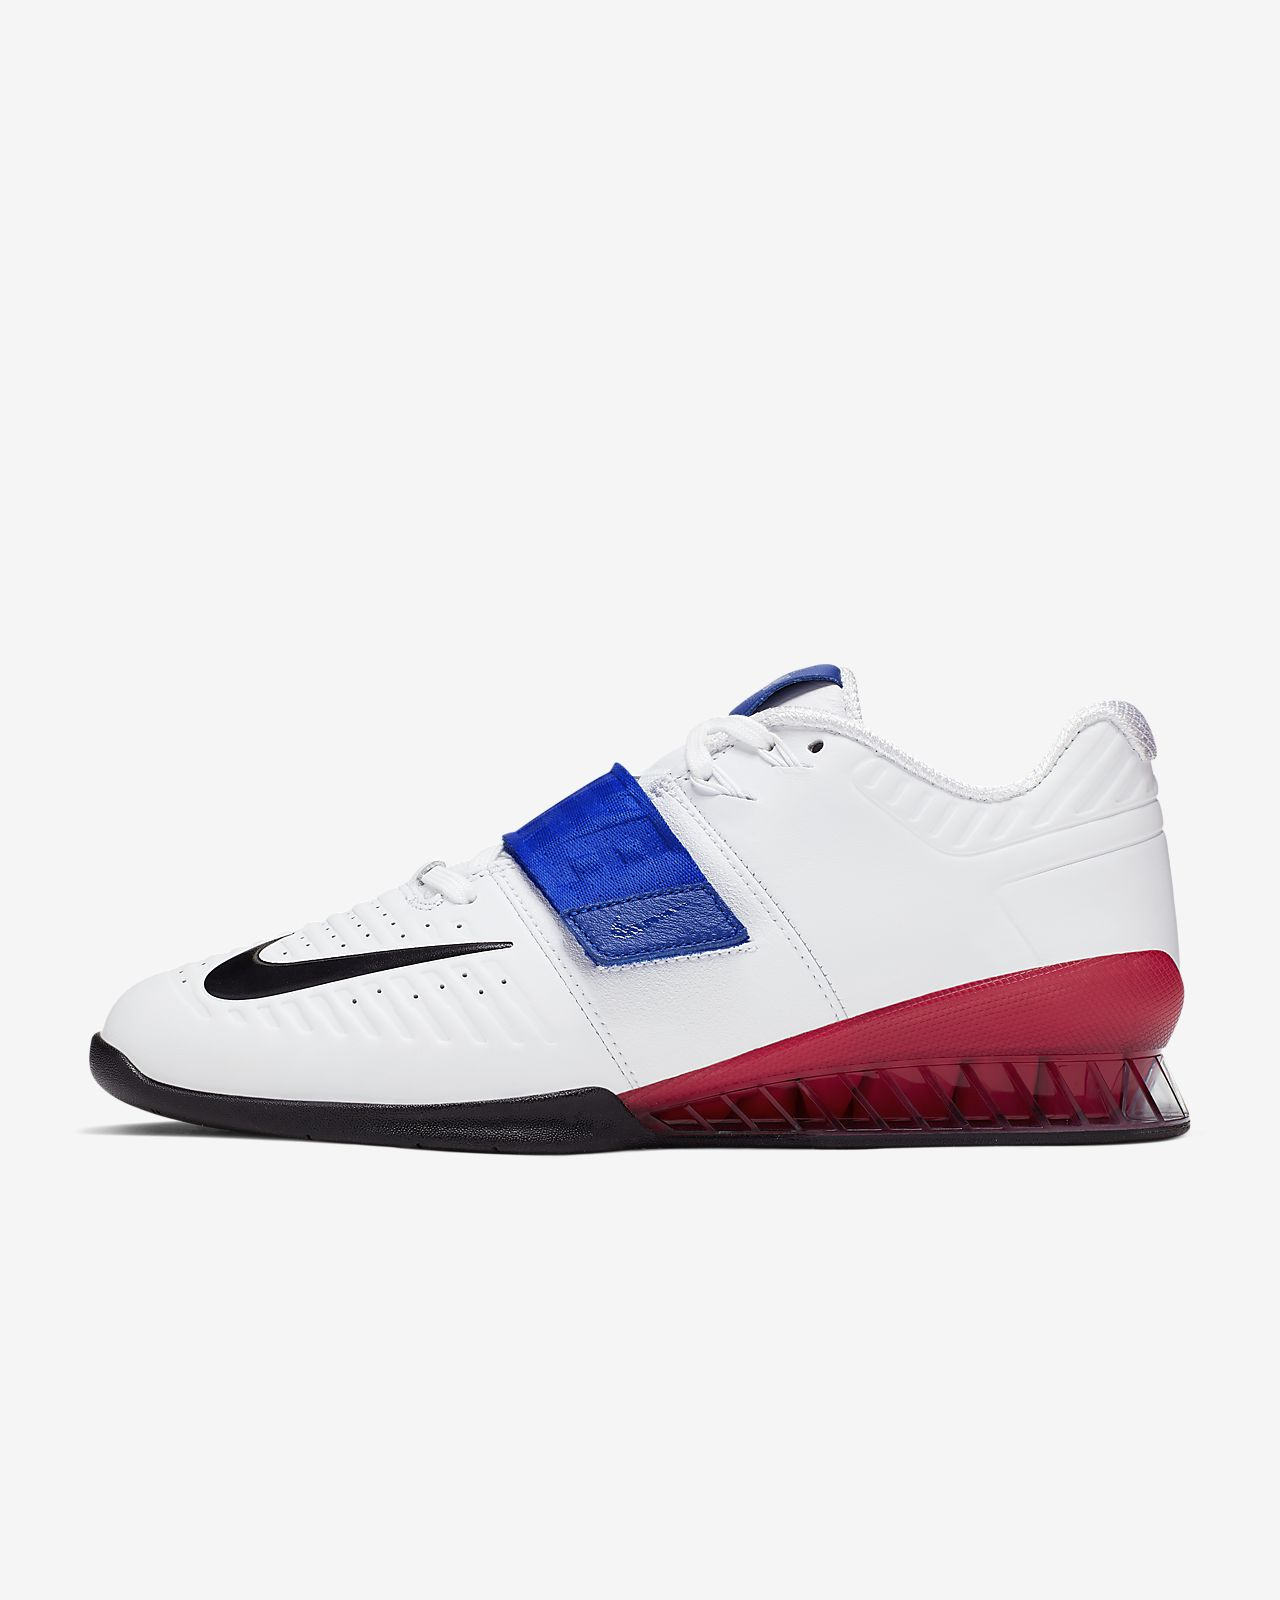 Nike Running Shoes Women Pink Honeycomb Women Dirt Cheap